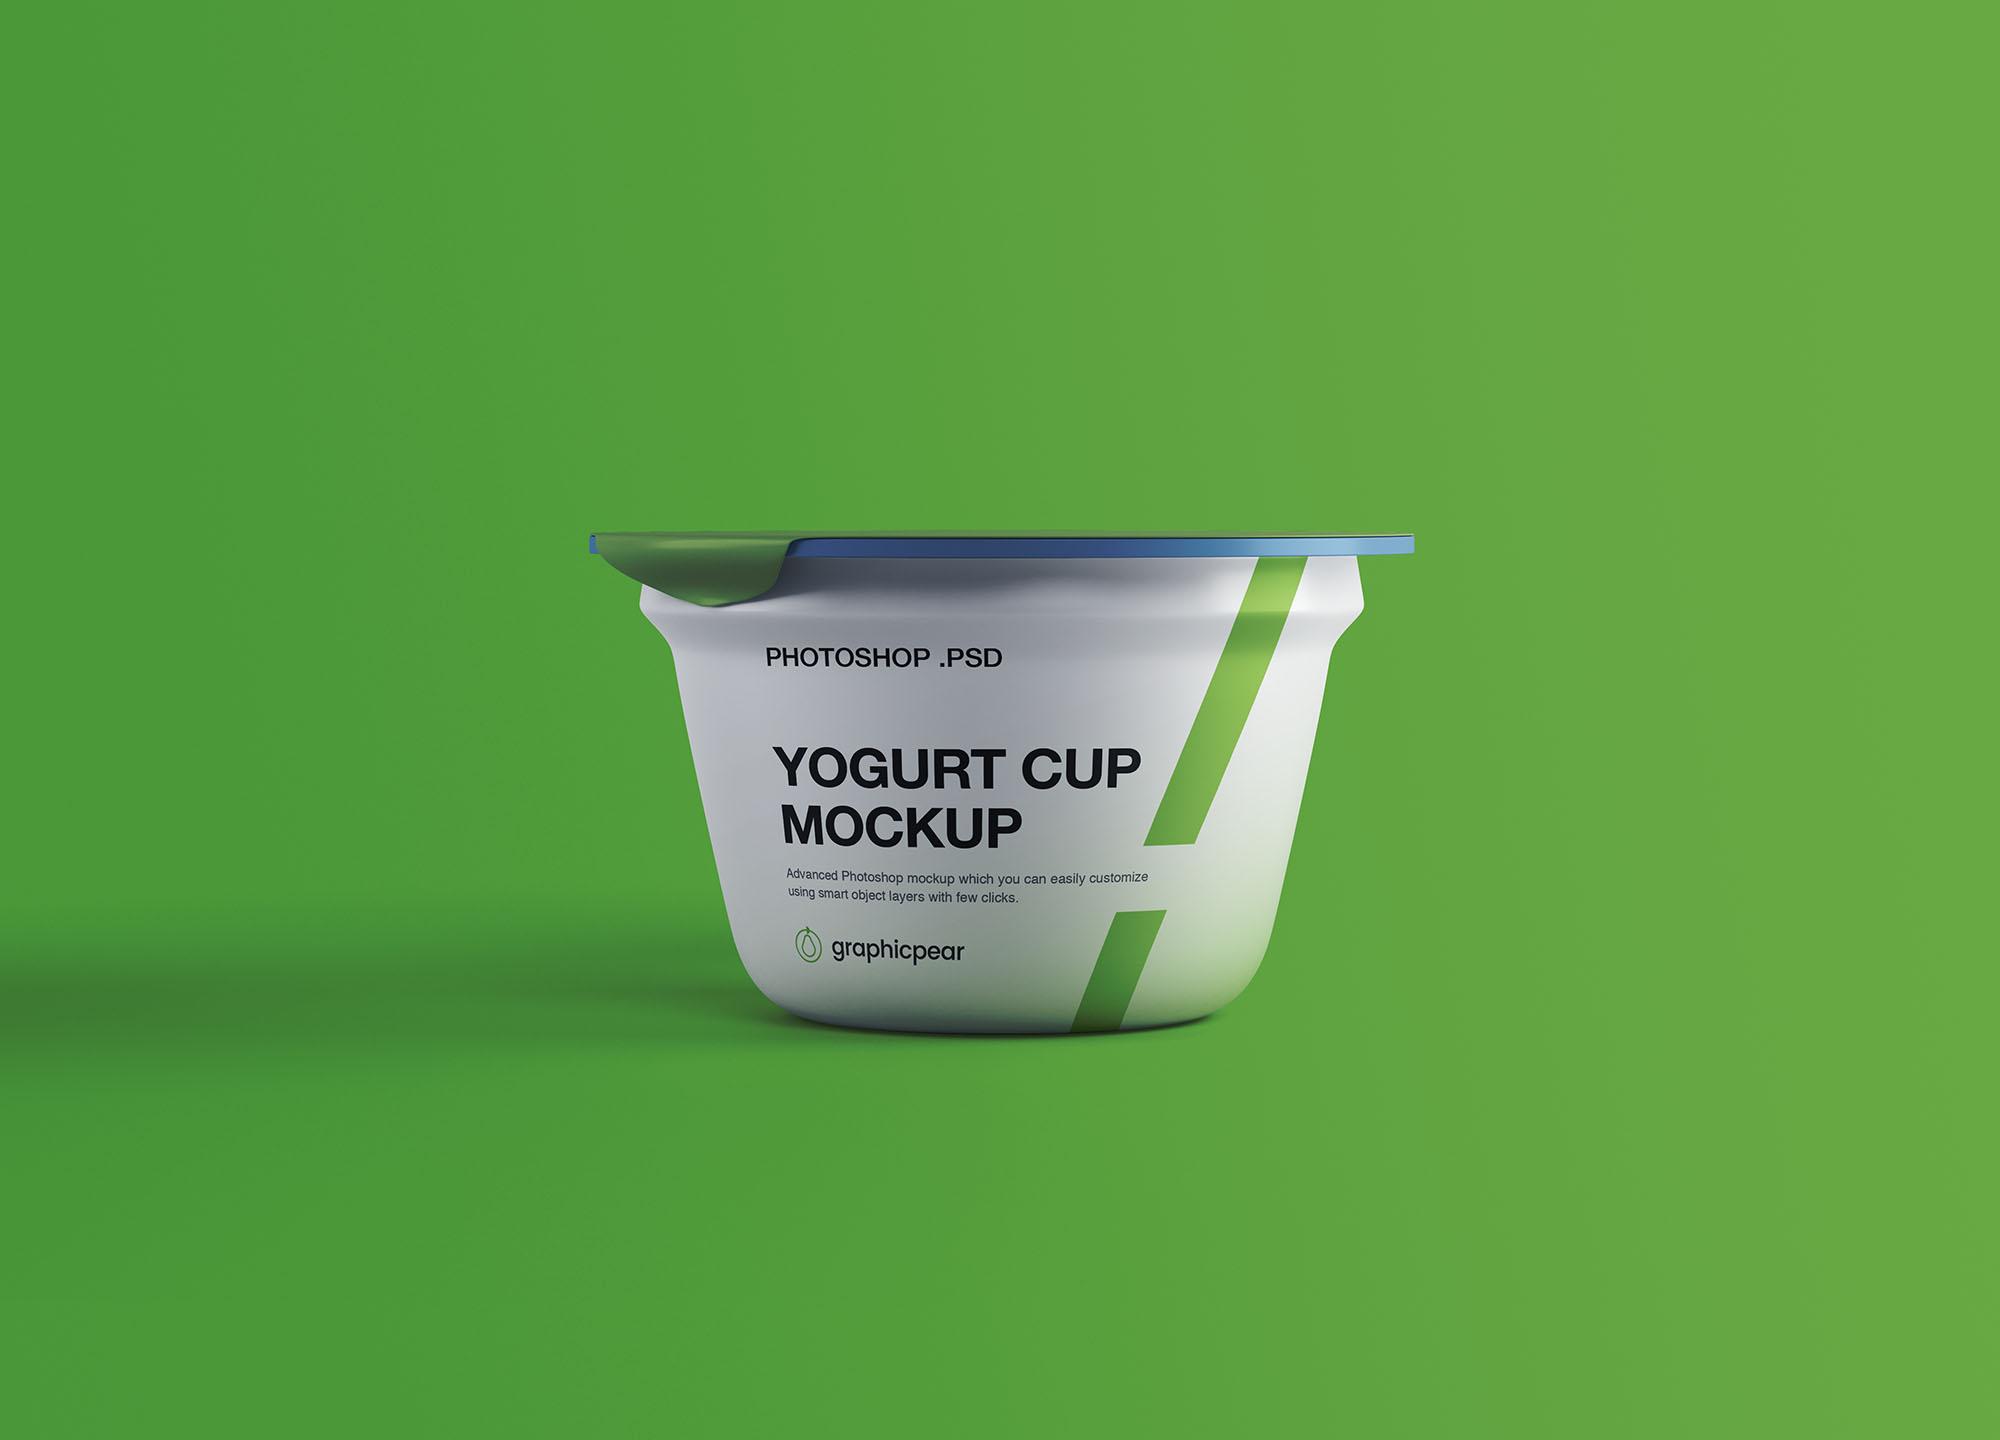 Yogurt Cup Mockup